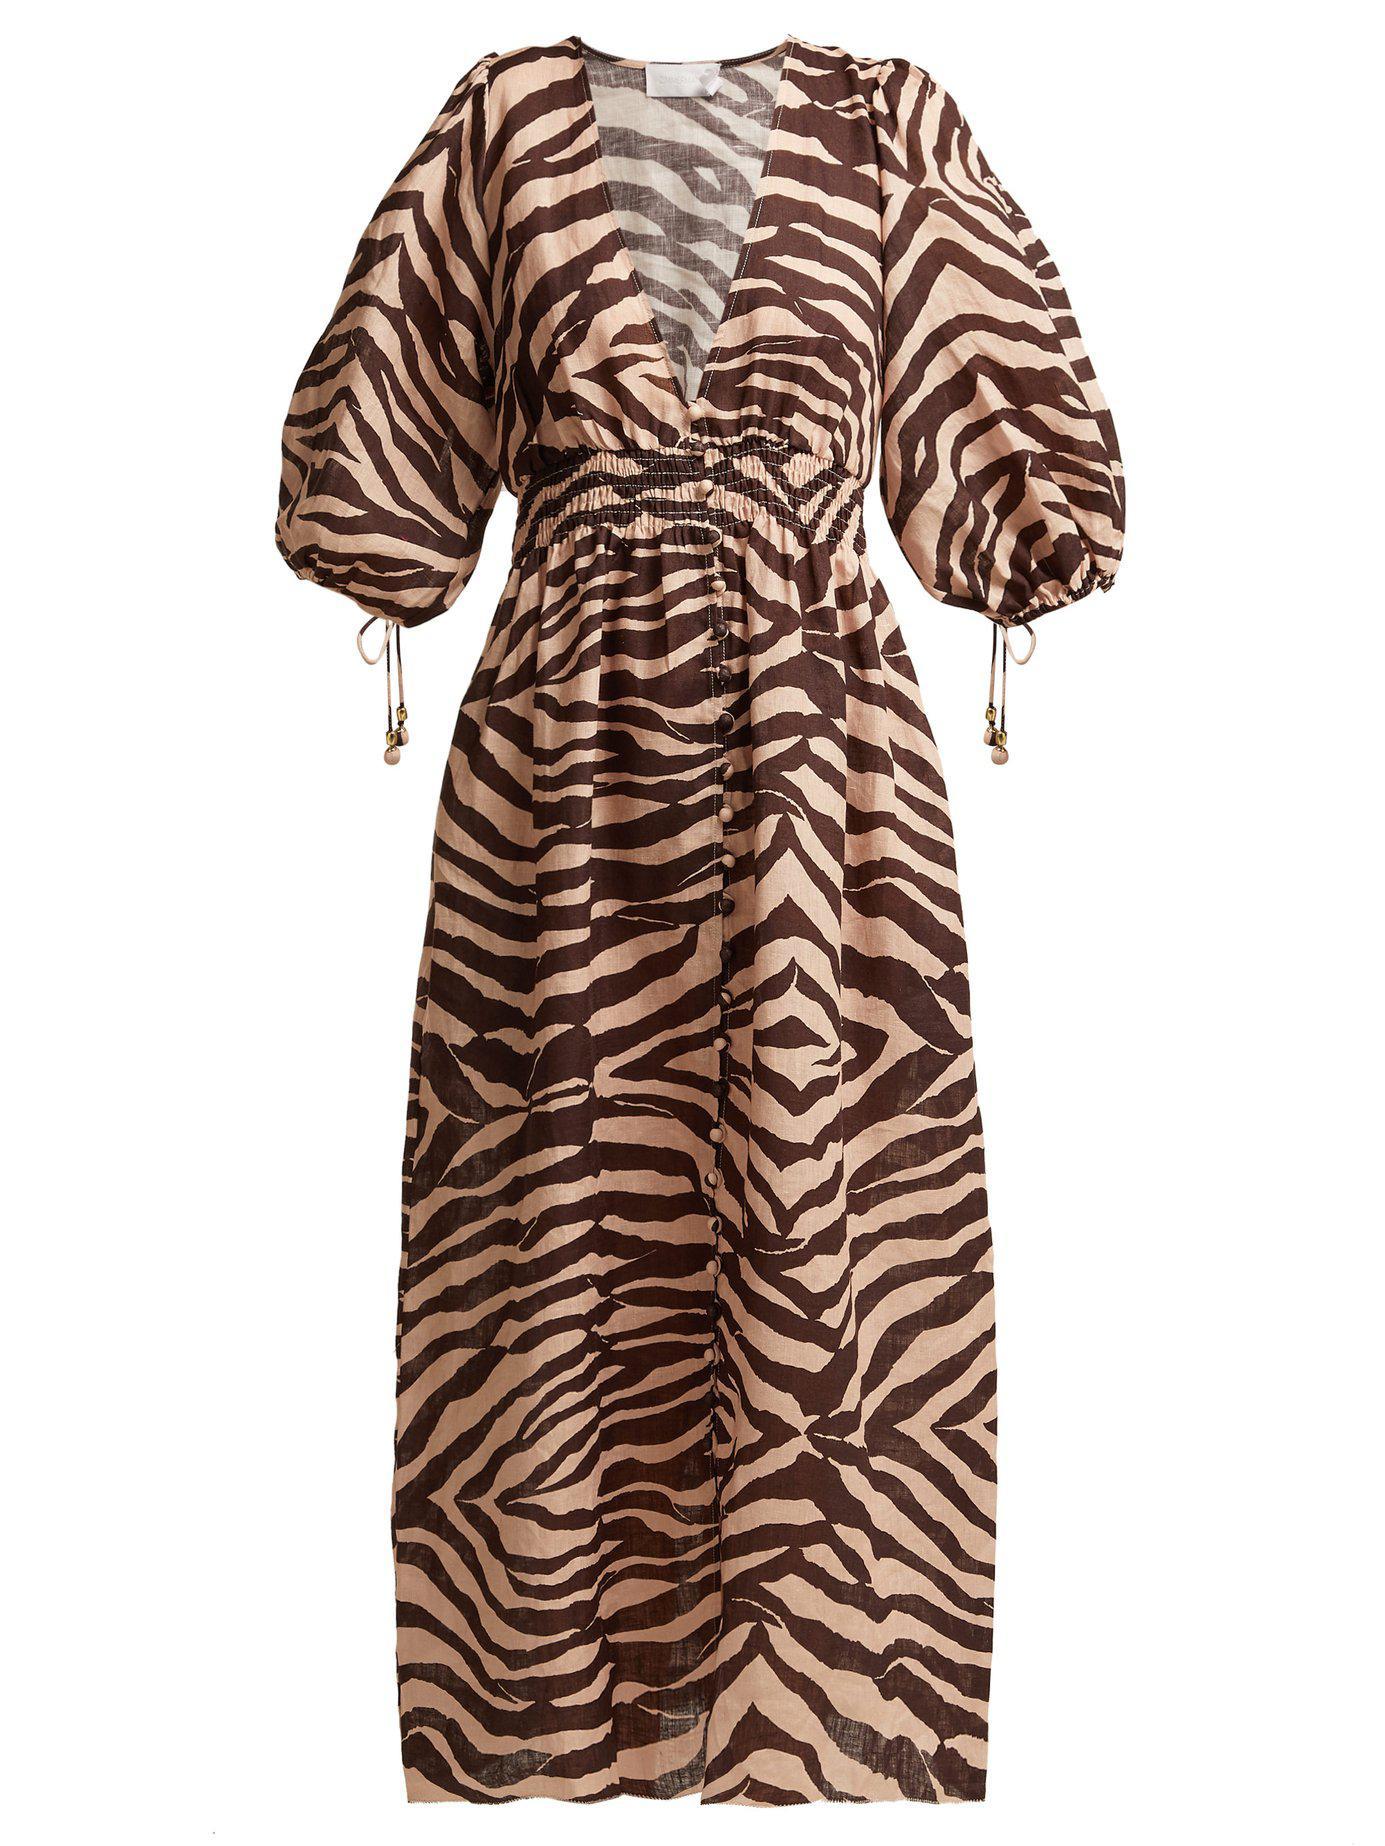 6c1c02d08d Zimmermann. Women s Zebra Print Linen Midi Dress